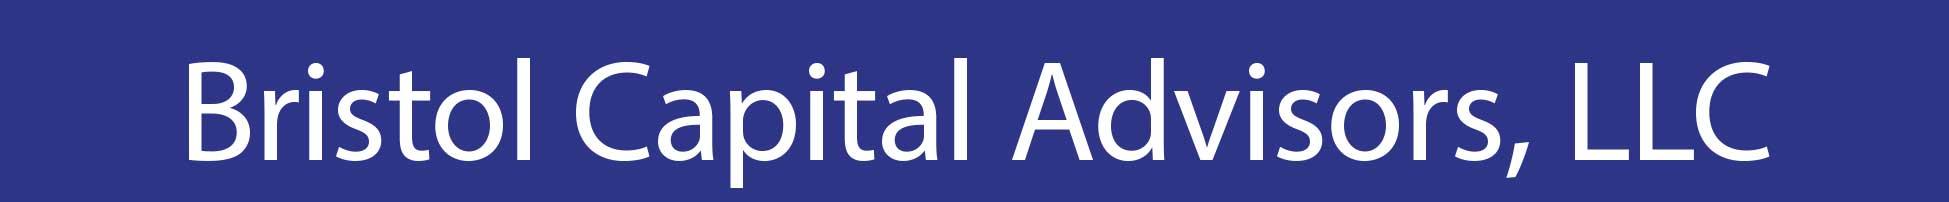 Bristol Capital Advisors